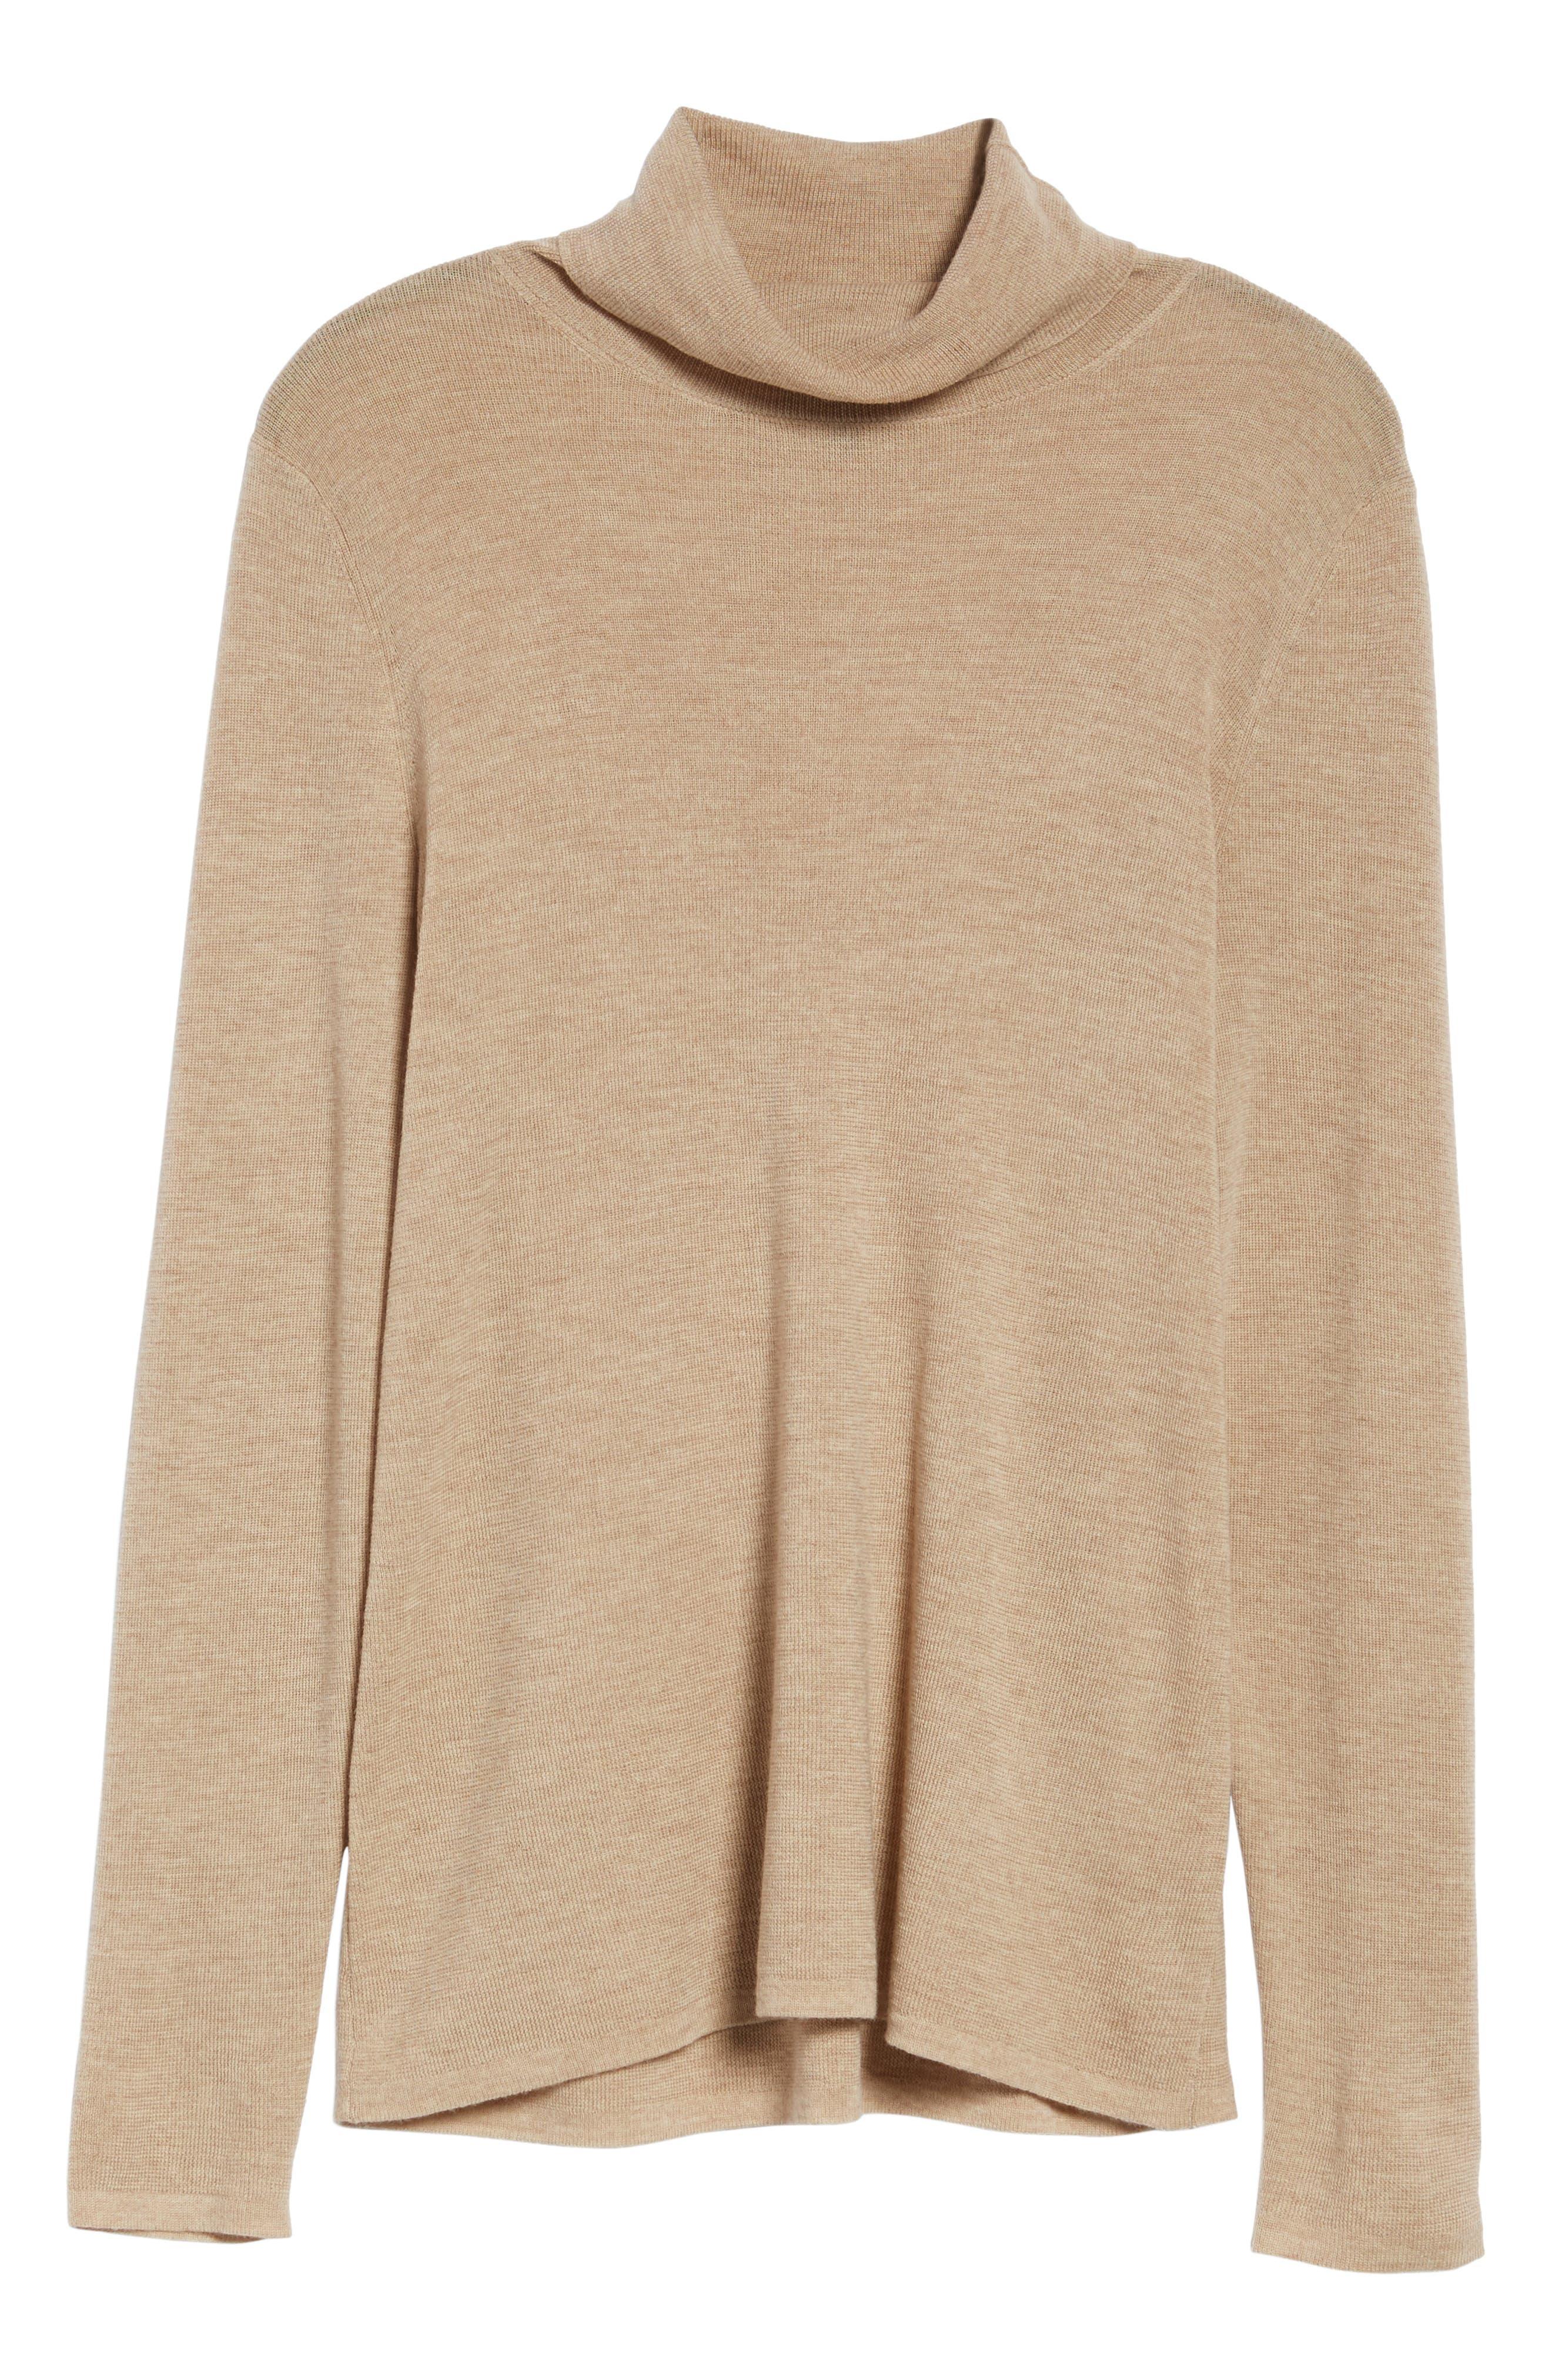 The Fisher Project Ultrafine Merino Turtleneck Sweater,                             Alternate thumbnail 6, color,                             Maple Oat